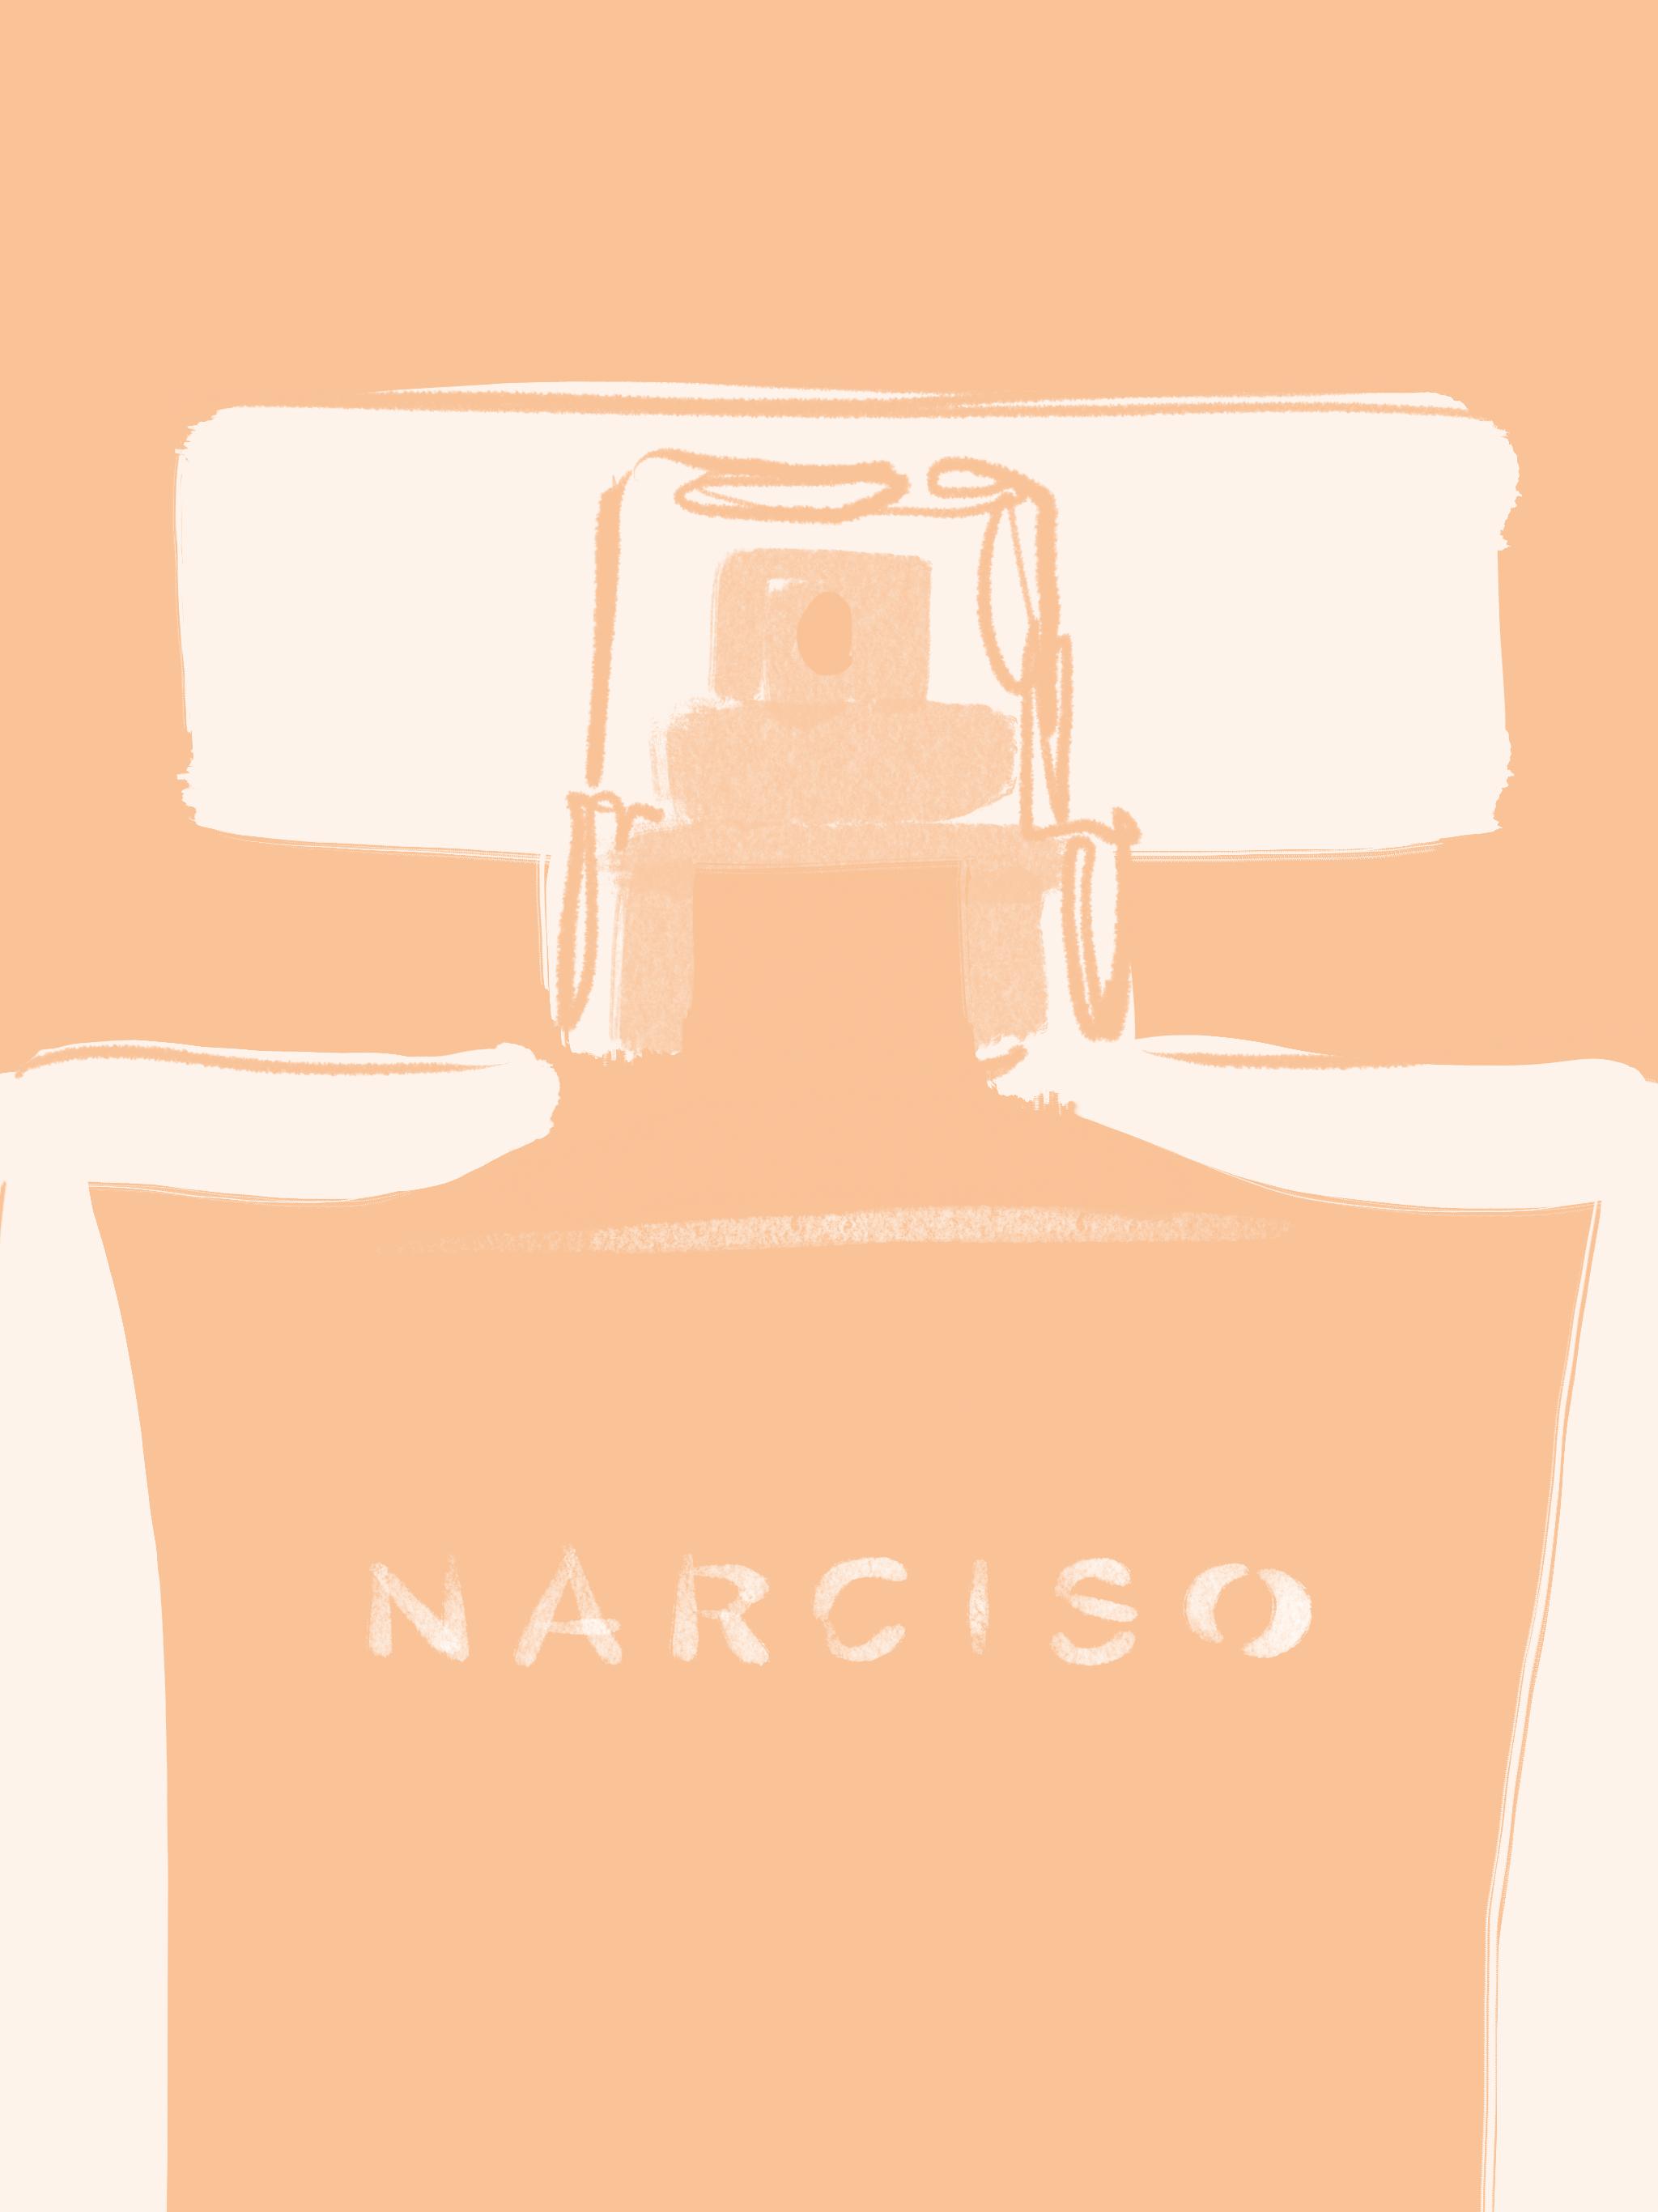 Peach perfume bottle, beauty illustration by Silvana Mariani